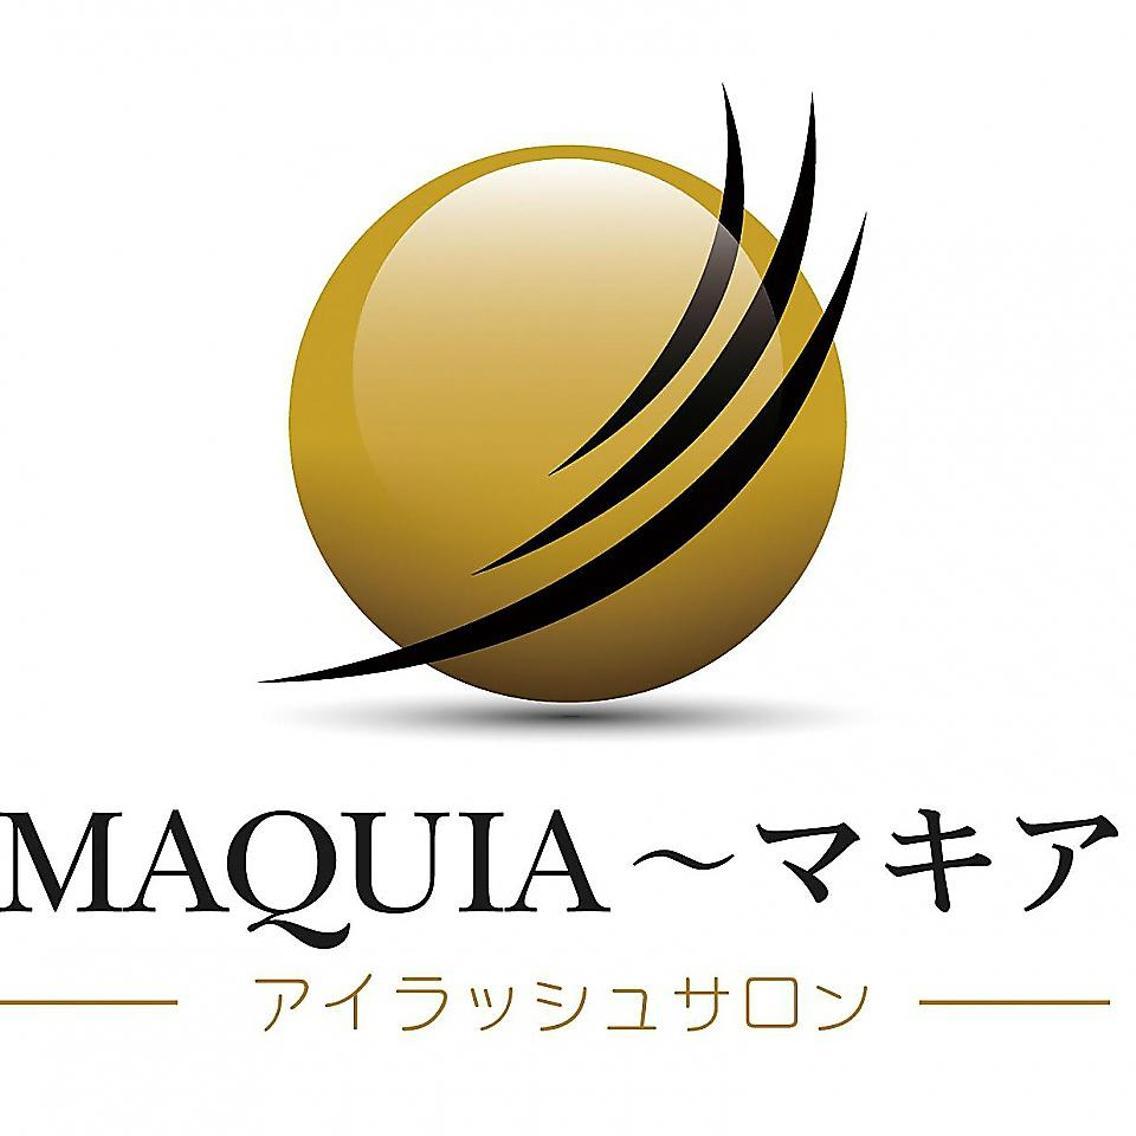 MAQUIA金沢香林坊店所属・MAQUIA香林坊店 松井の掲載